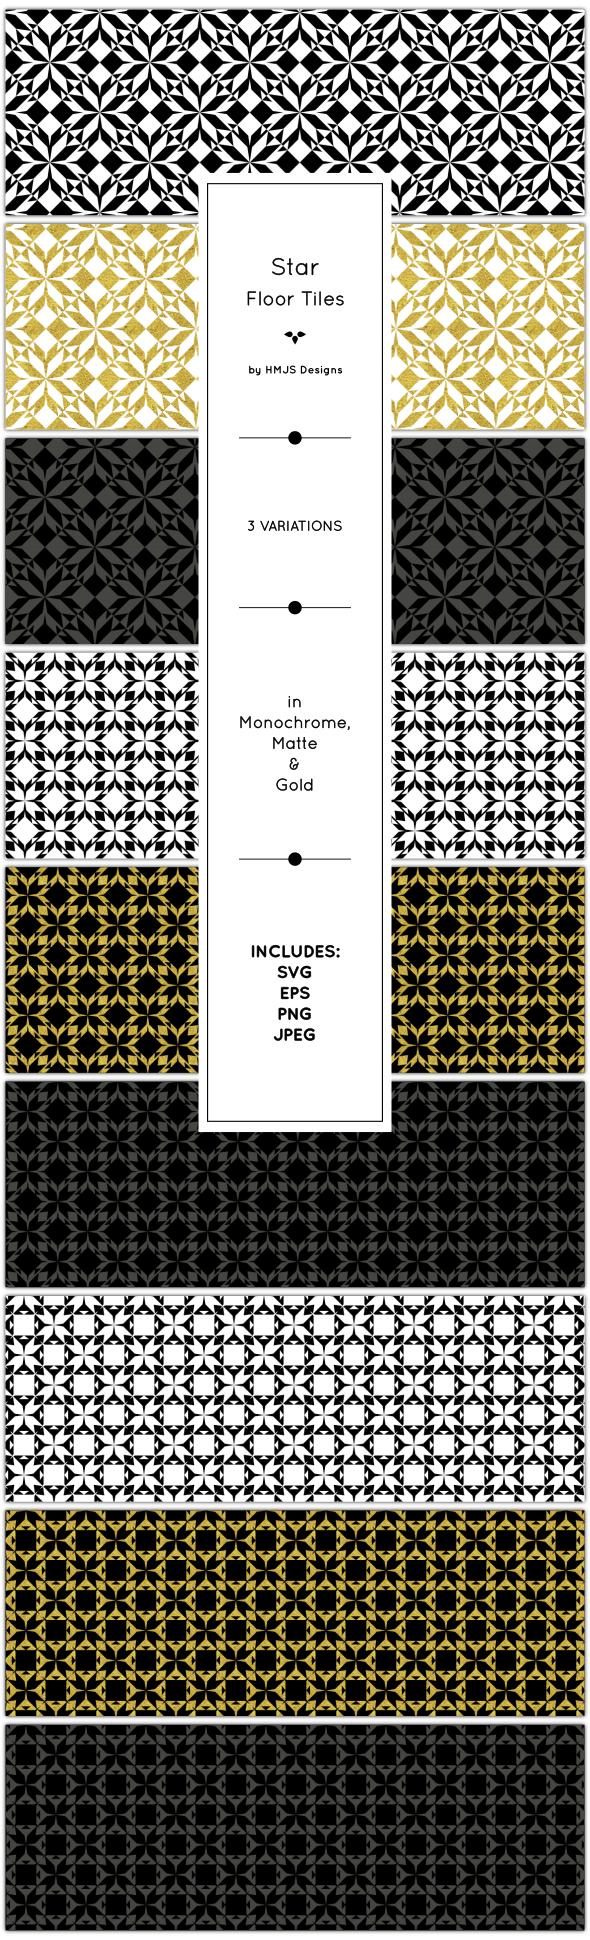 Star Floor Tiles - Textures / Fills / Patterns Illustrator